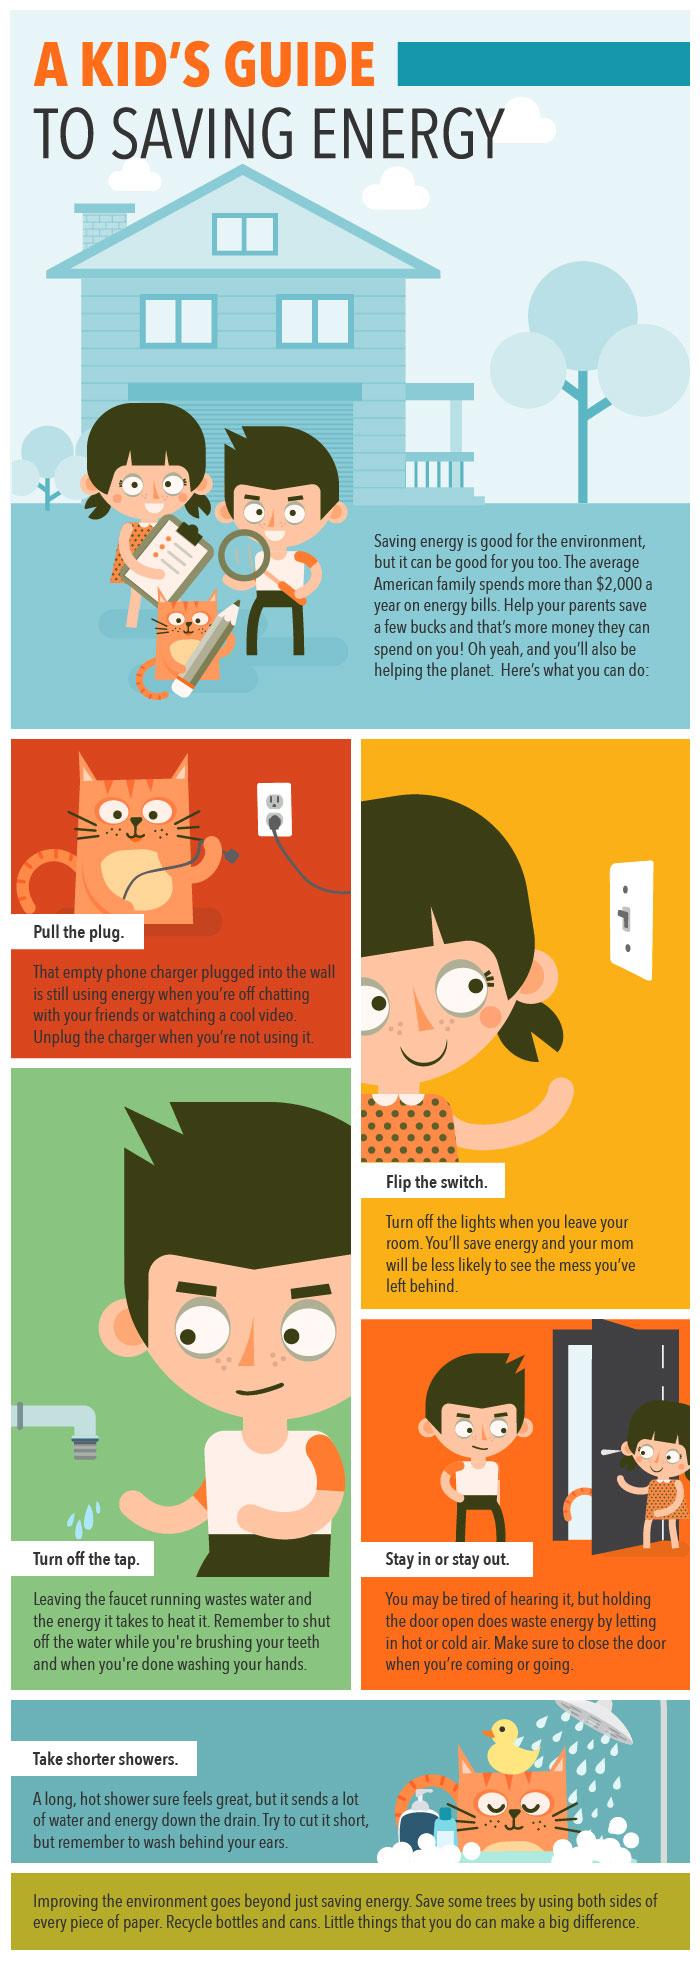 Kid's Guide to Saving Energy